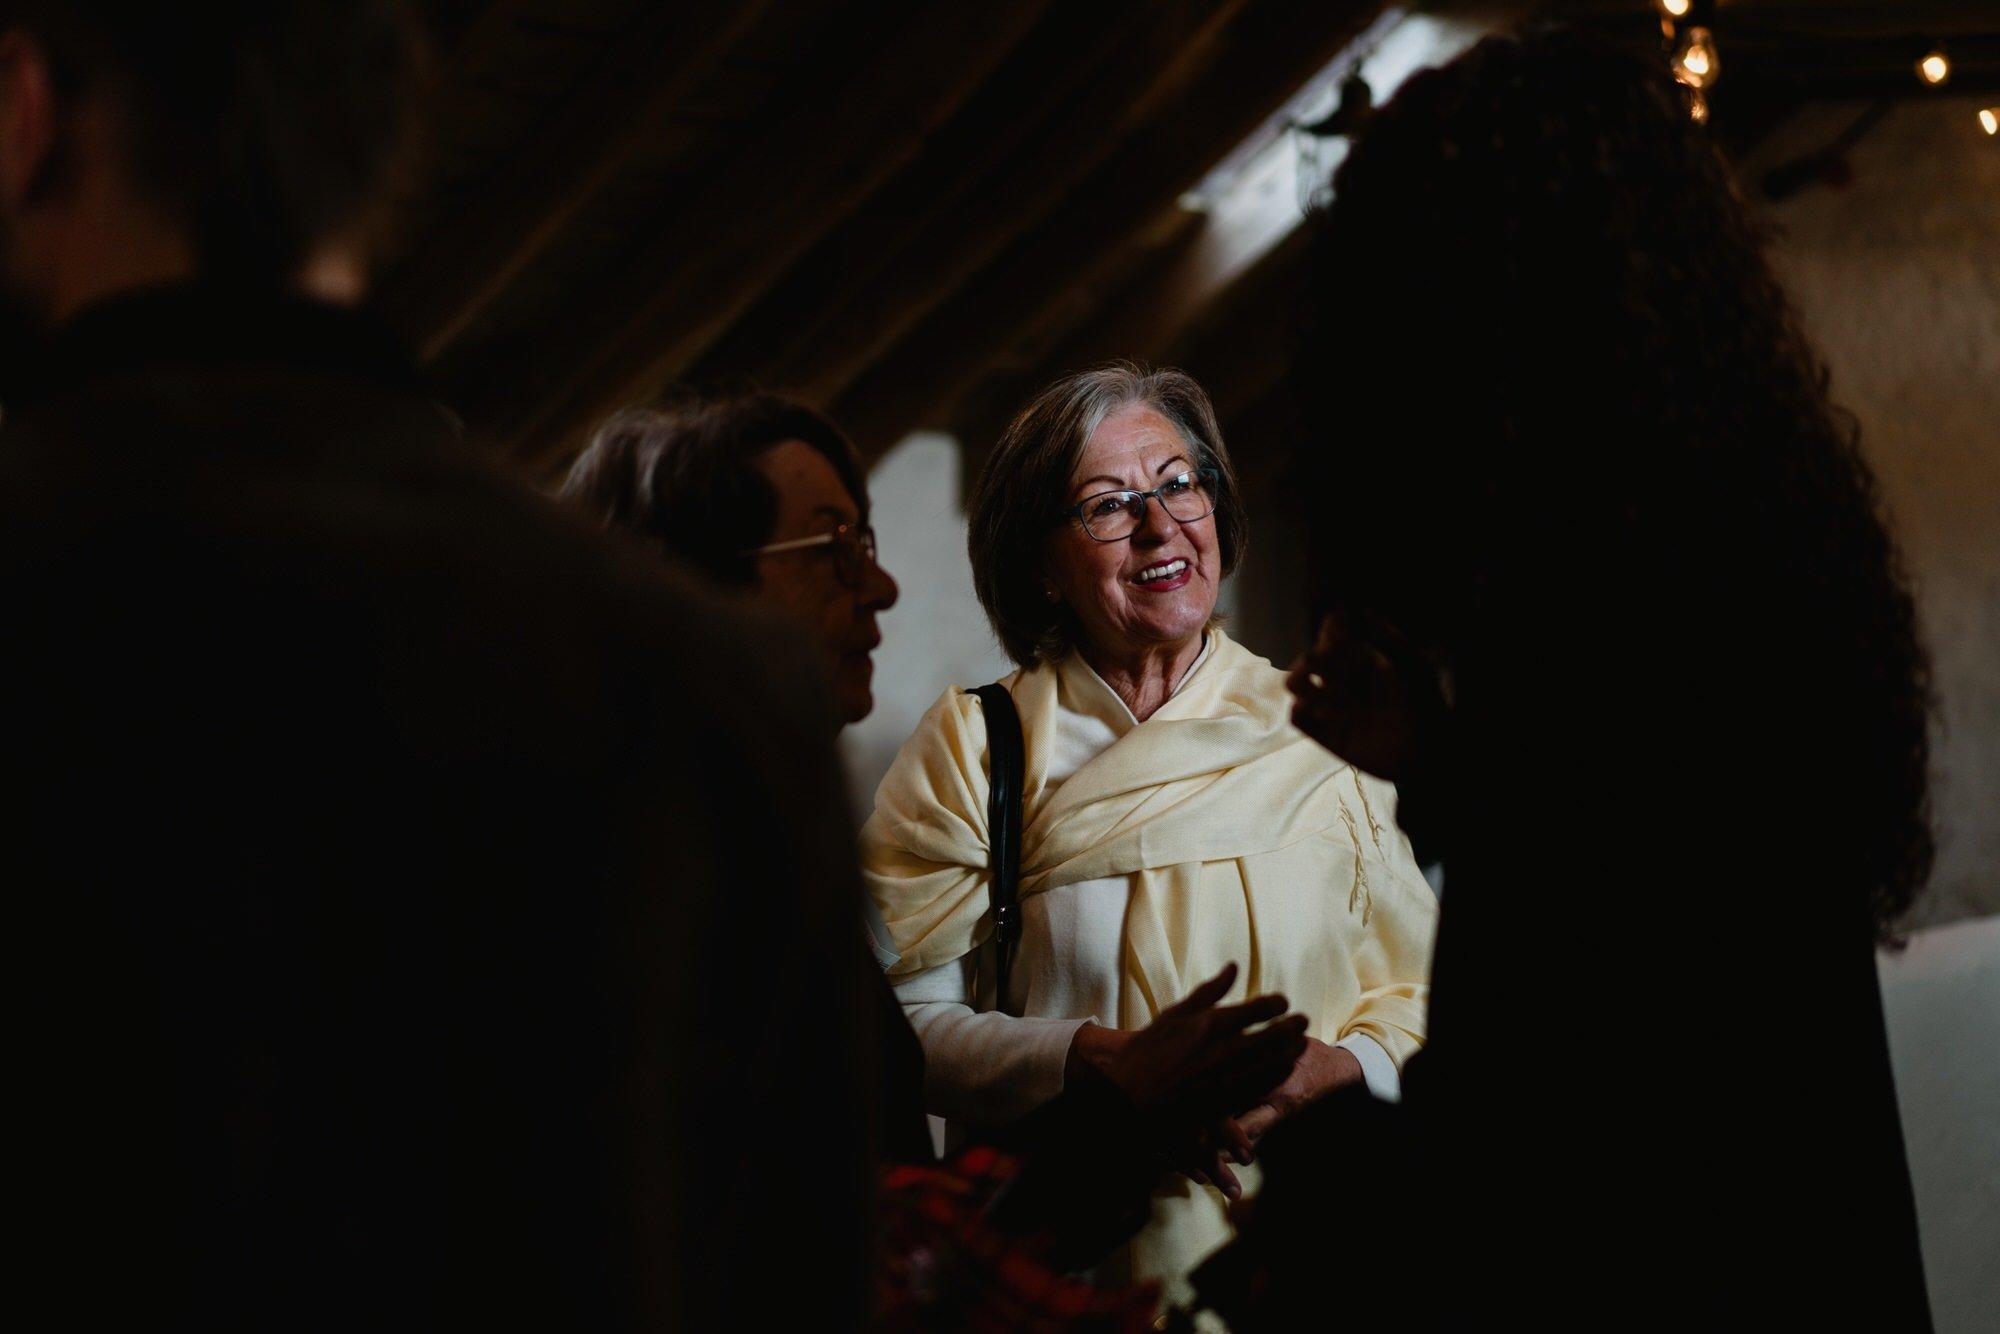 003 TIN SHED KNOCKRAICH WEDDING AUSTRIAN SCOTTISH ZOE ALEXANDRA PHOTOGRAPHY